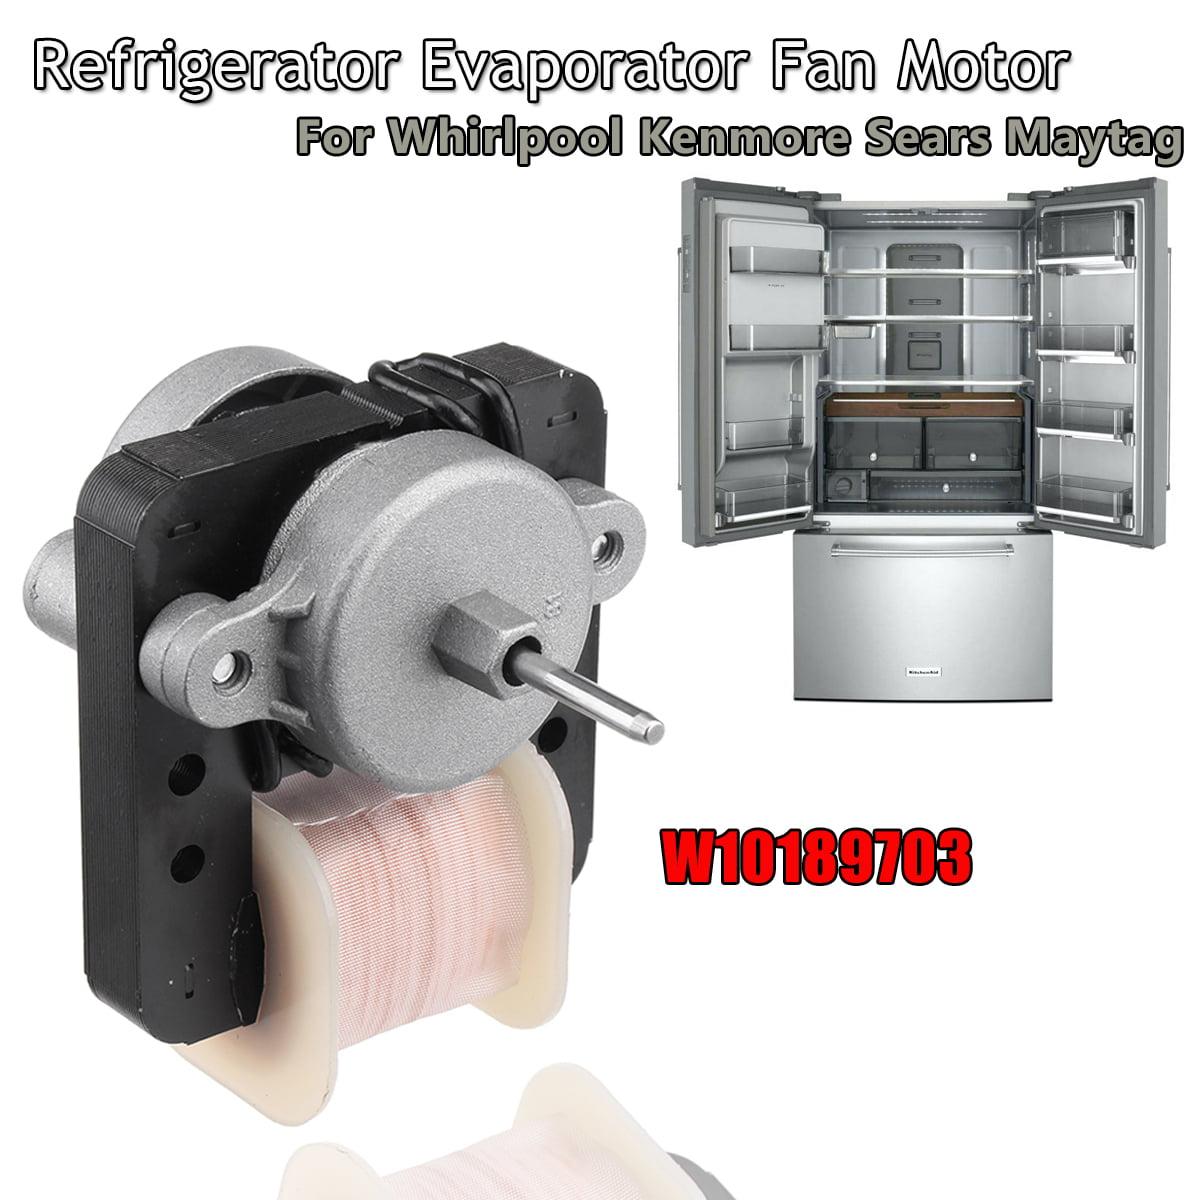 W10189703 NEW Whirlpool Refrigerator Evaporator Fan Motor Genuine OEM New In Box